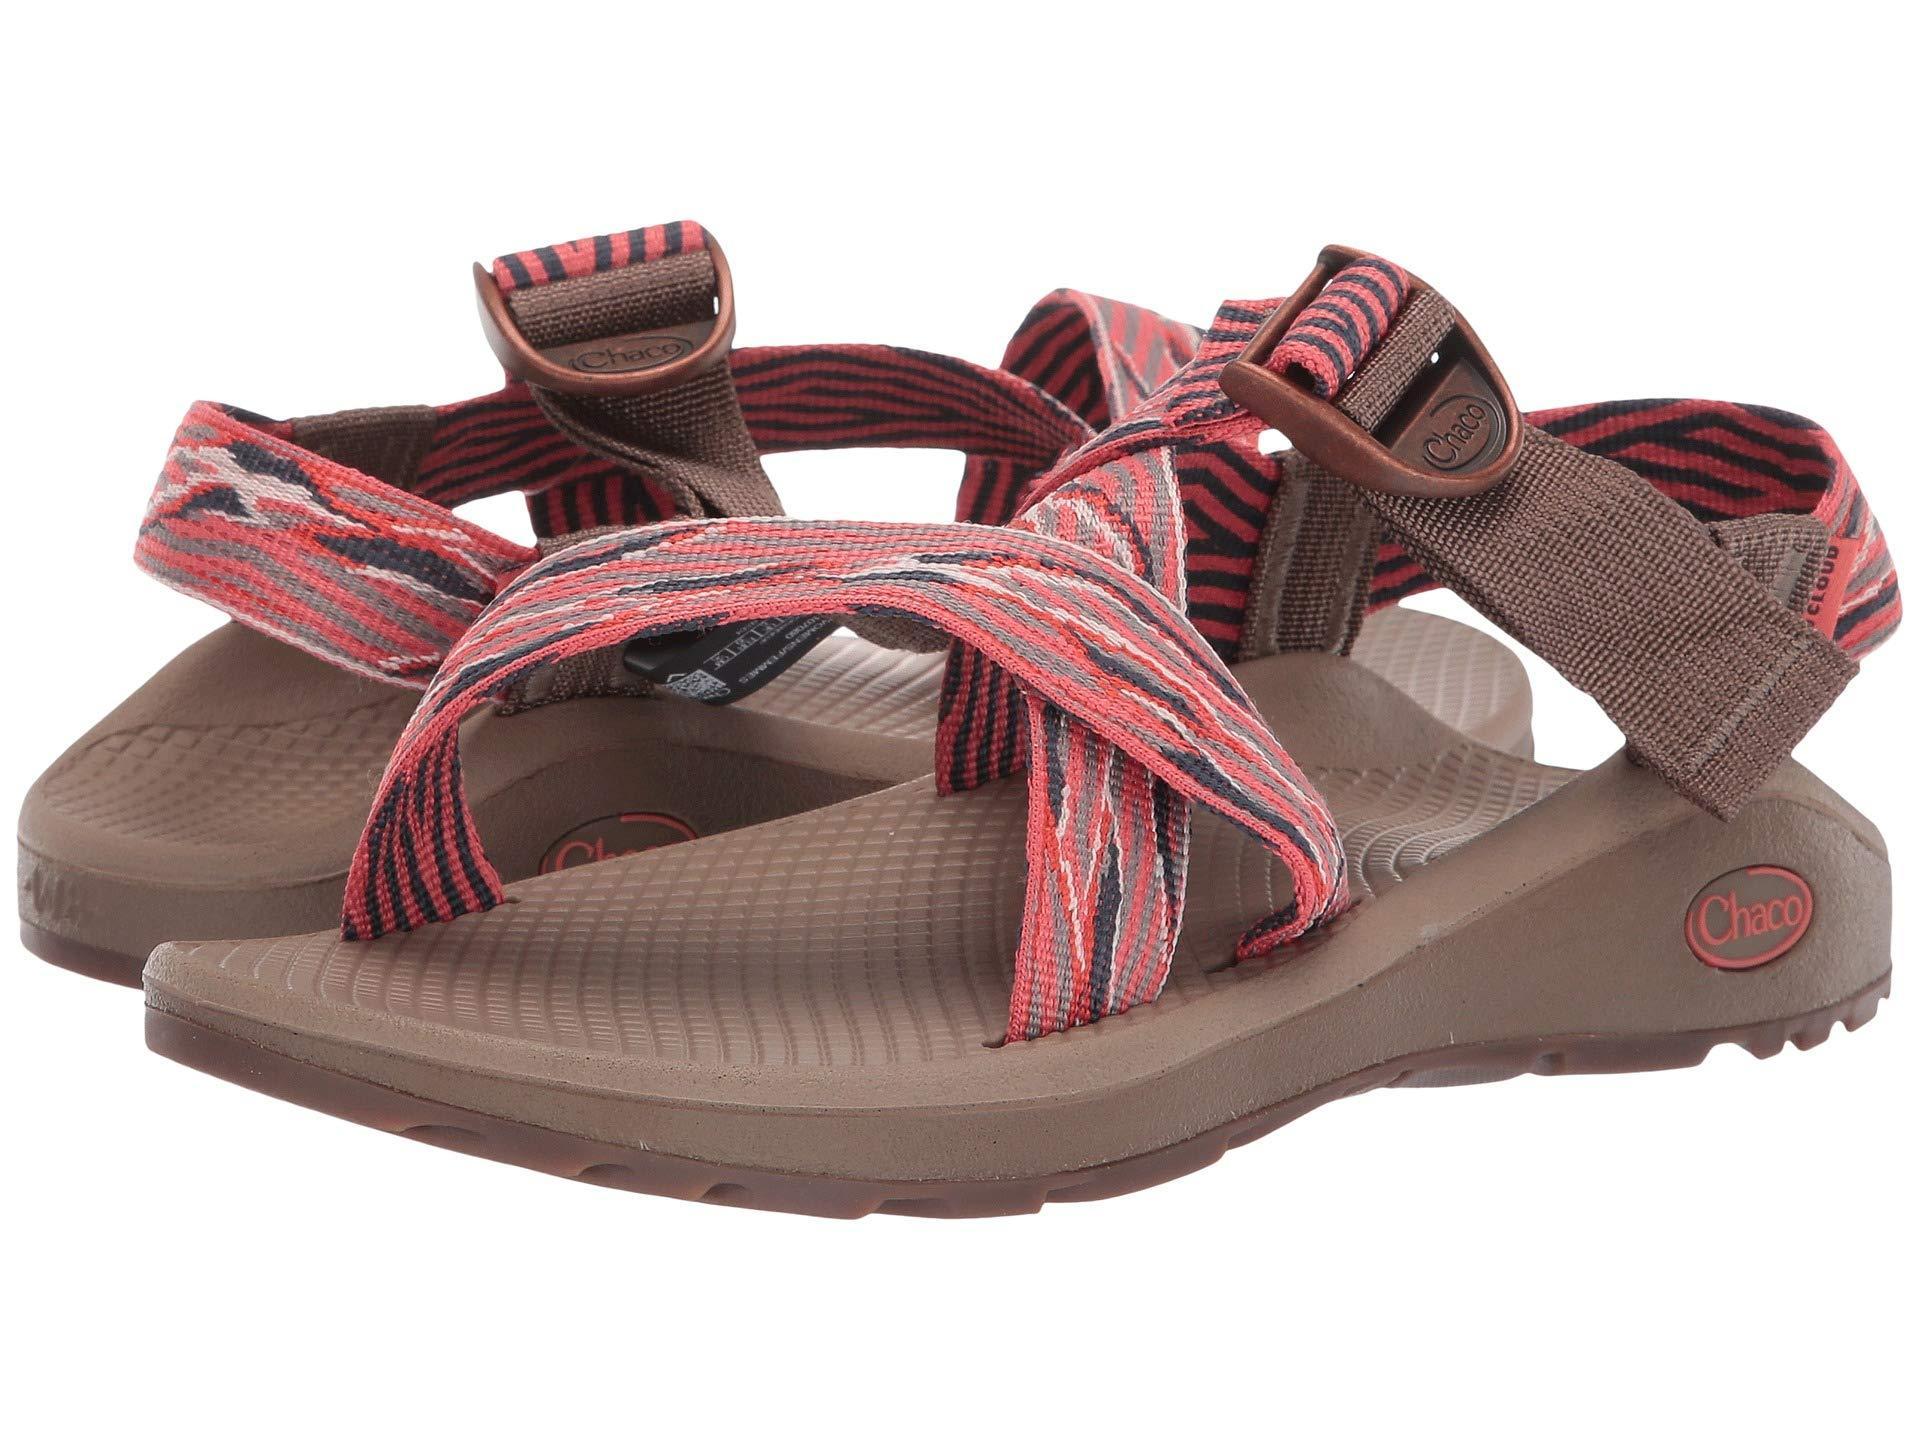 f2bfaa2d3179 Lyst - Chaco Mega Z Cloud (blend Grenadine) Women s Sandals